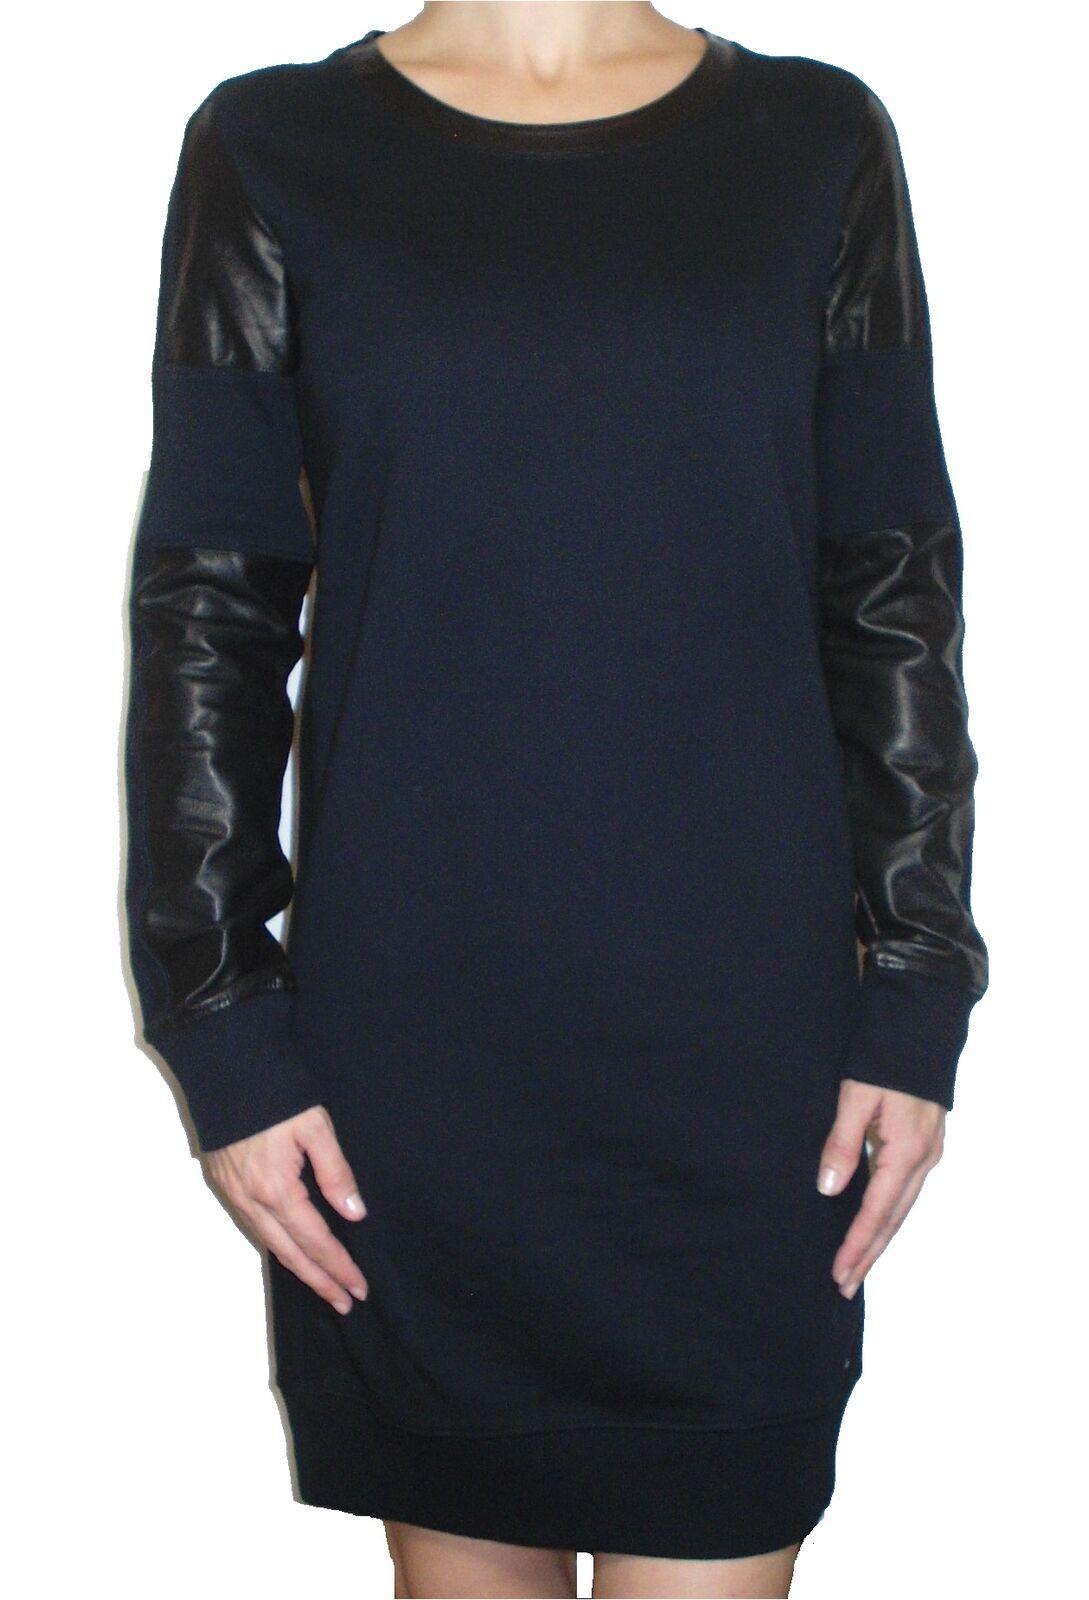 Diesel Stretch Damenkleid   D-ELAB  langarm schwarz Gr. XS Neu